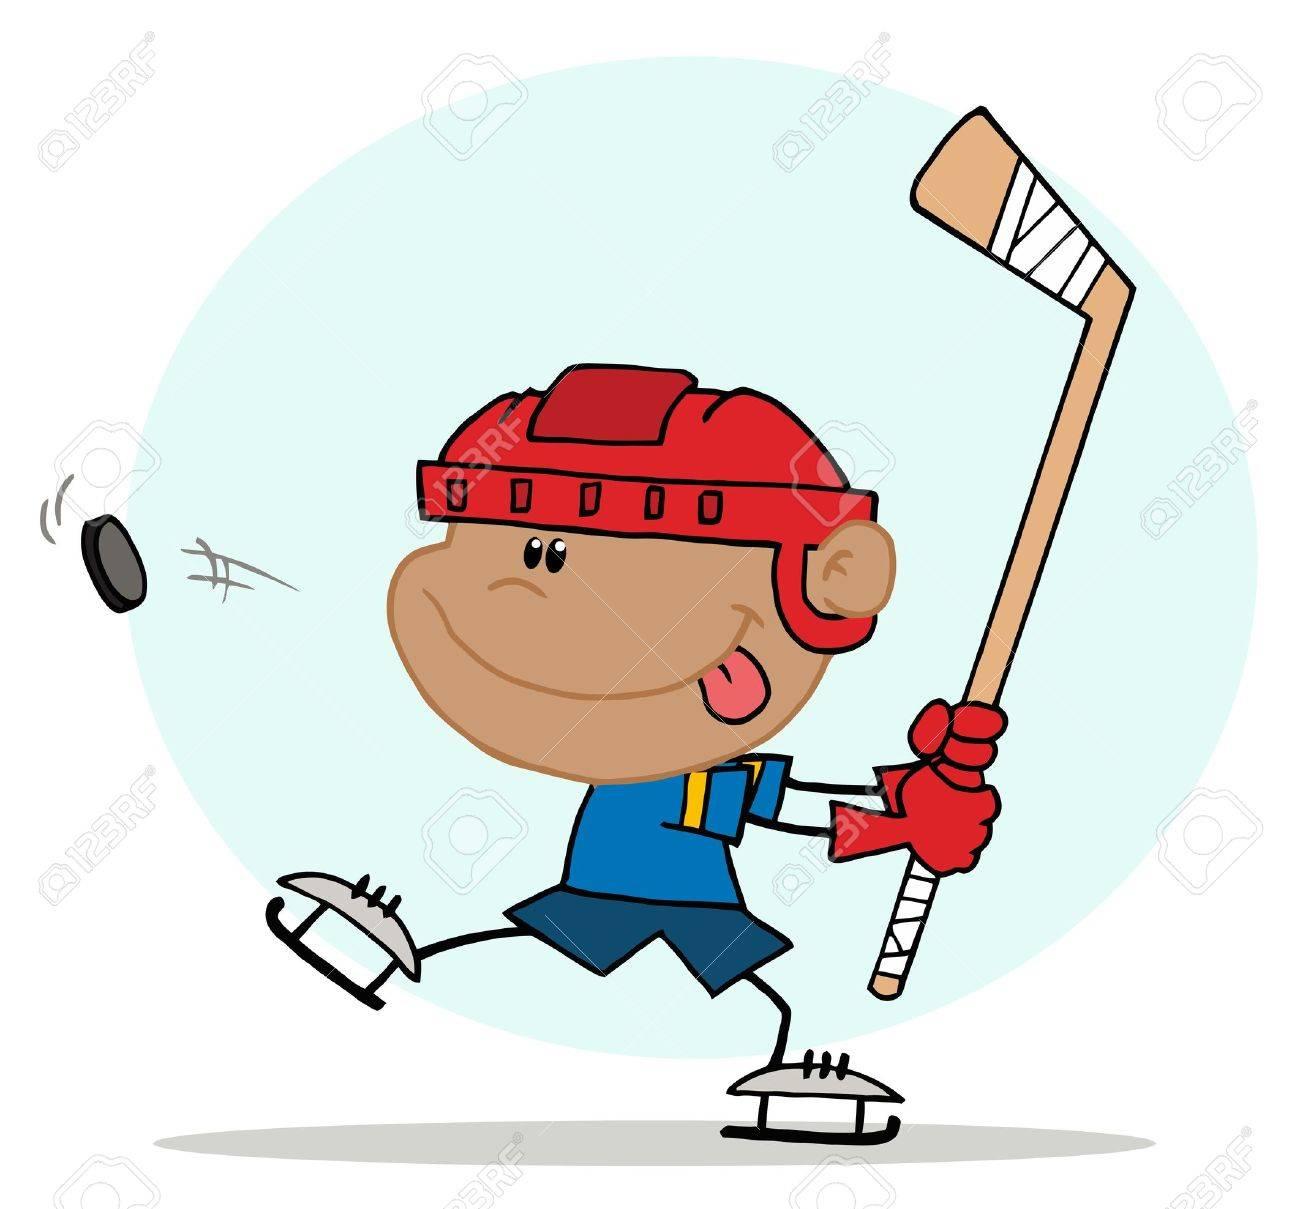 Athletic Hispanic Boy Preparing To Whack A Hockey Puck Stock Vector - 6906029